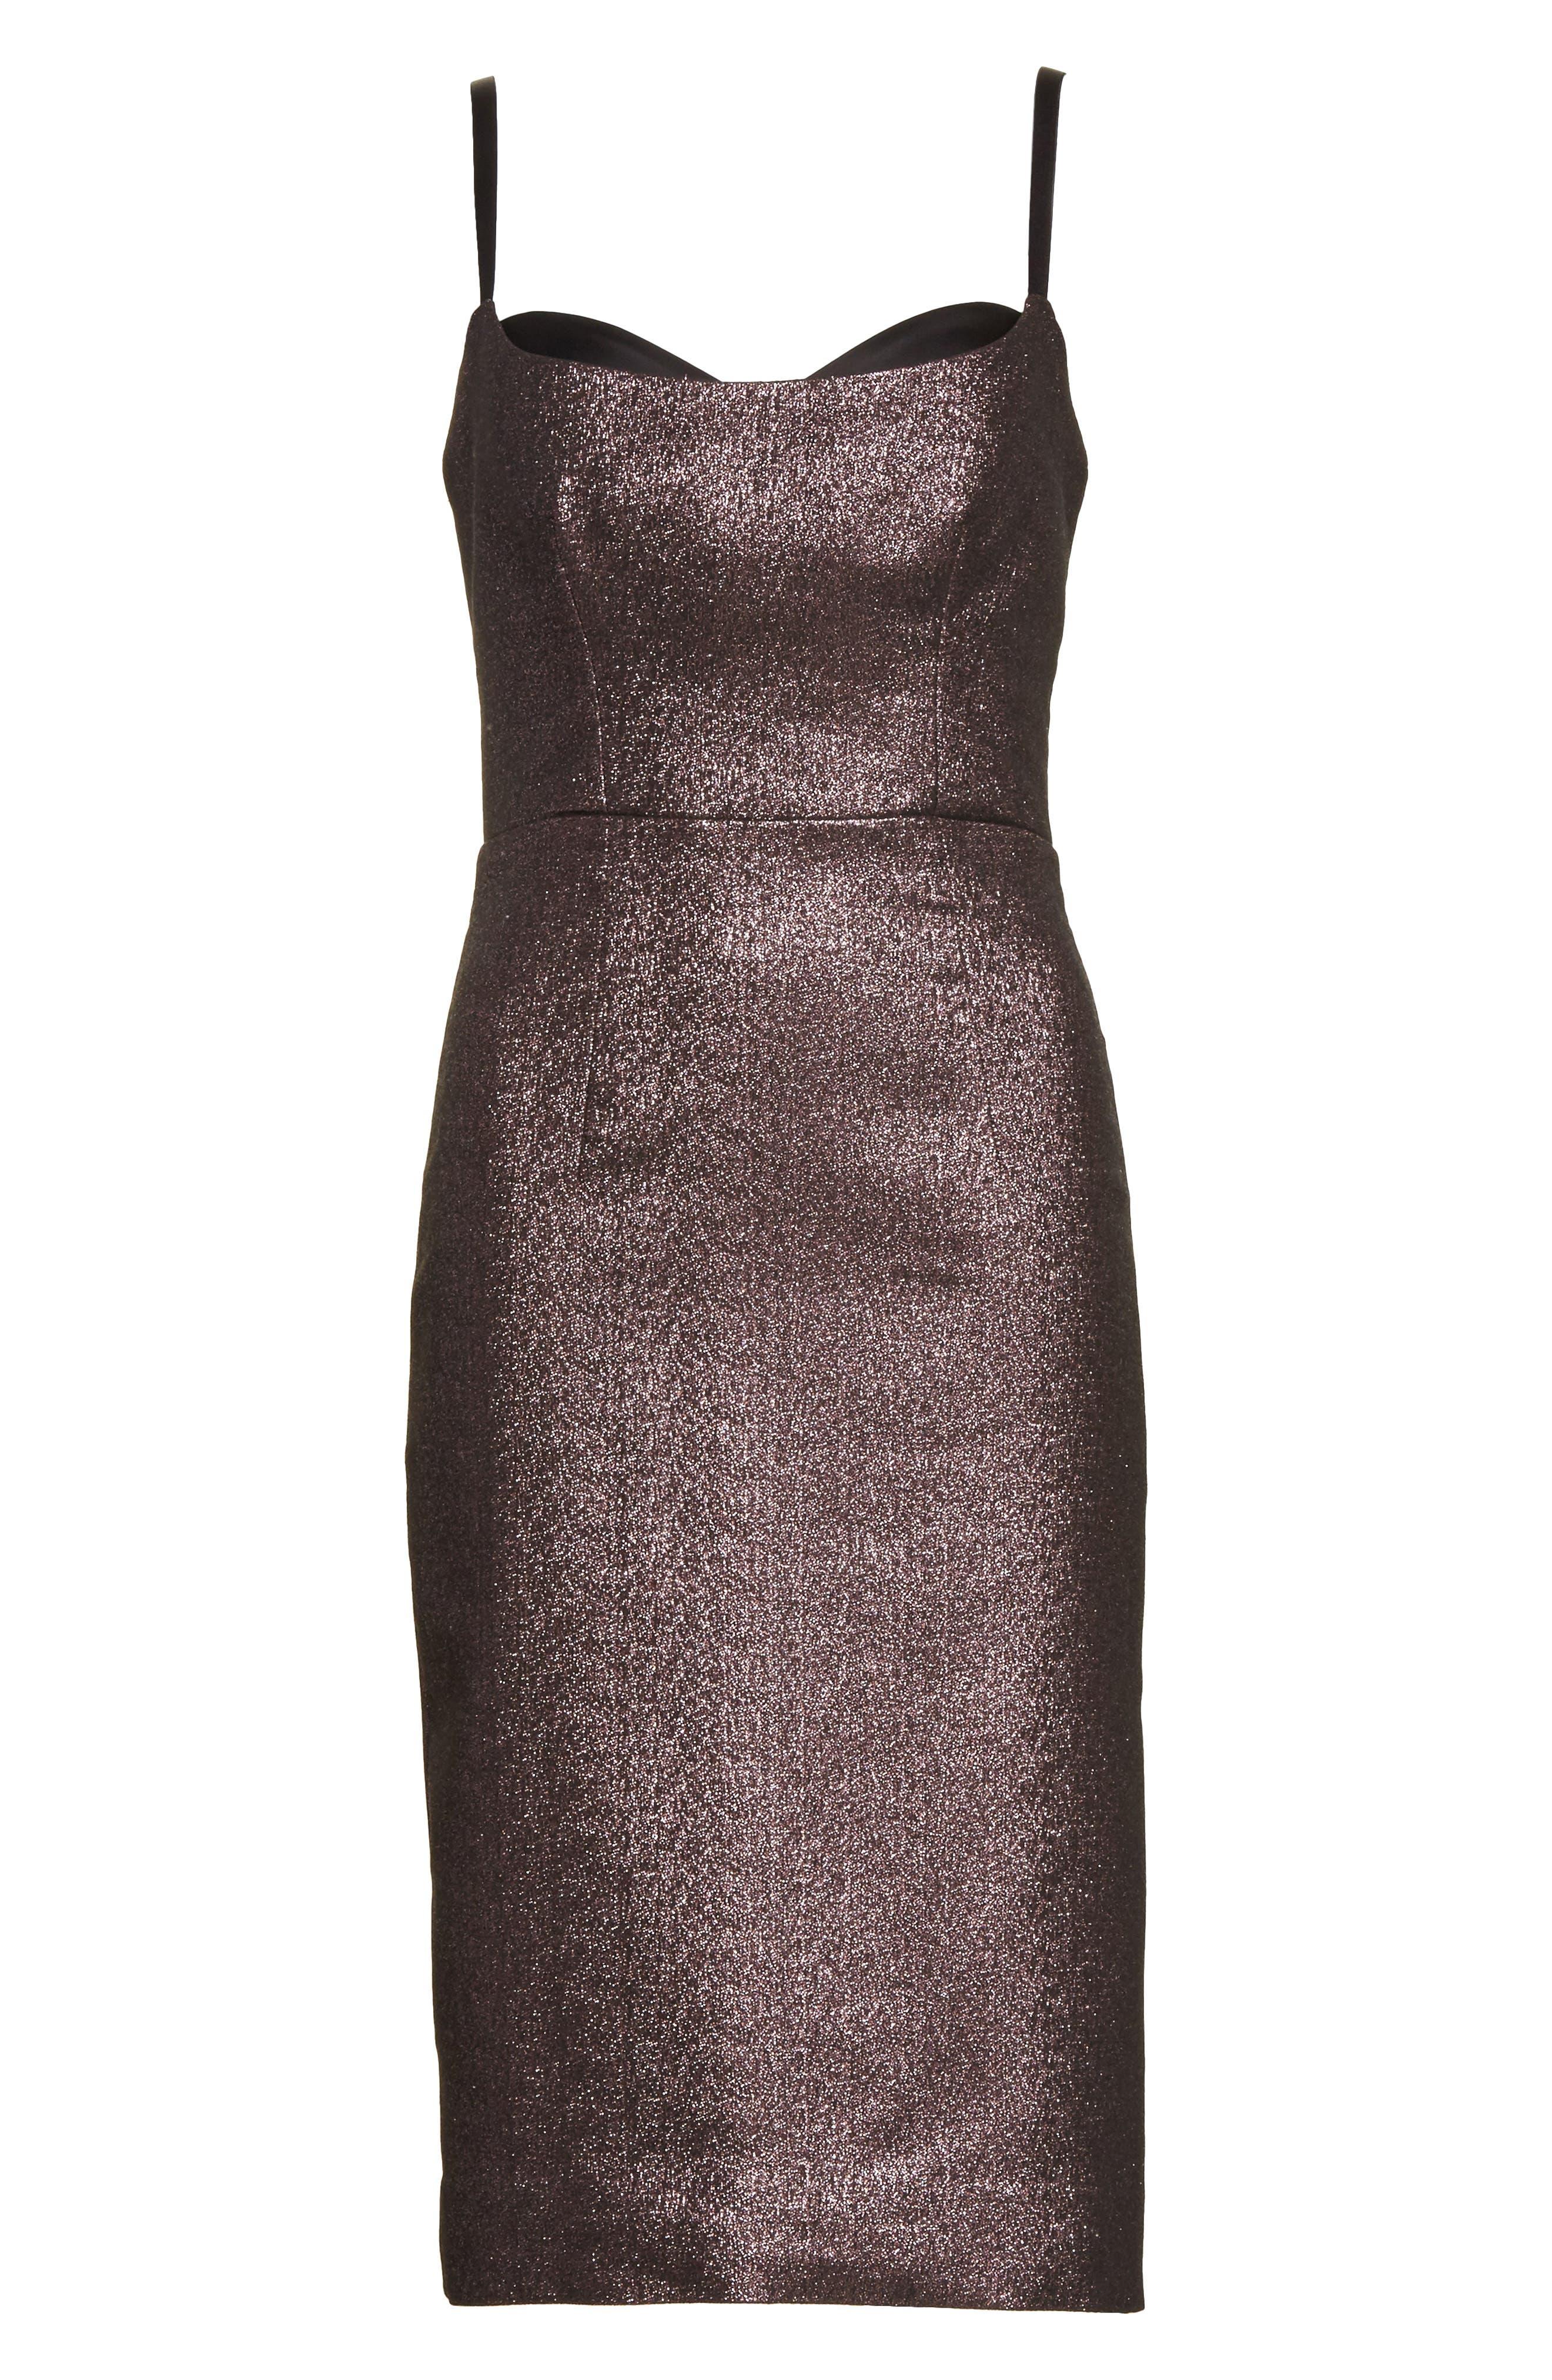 Tara Stretch Metallic Sheath Dress,                             Alternate thumbnail 6, color,                             Ballet